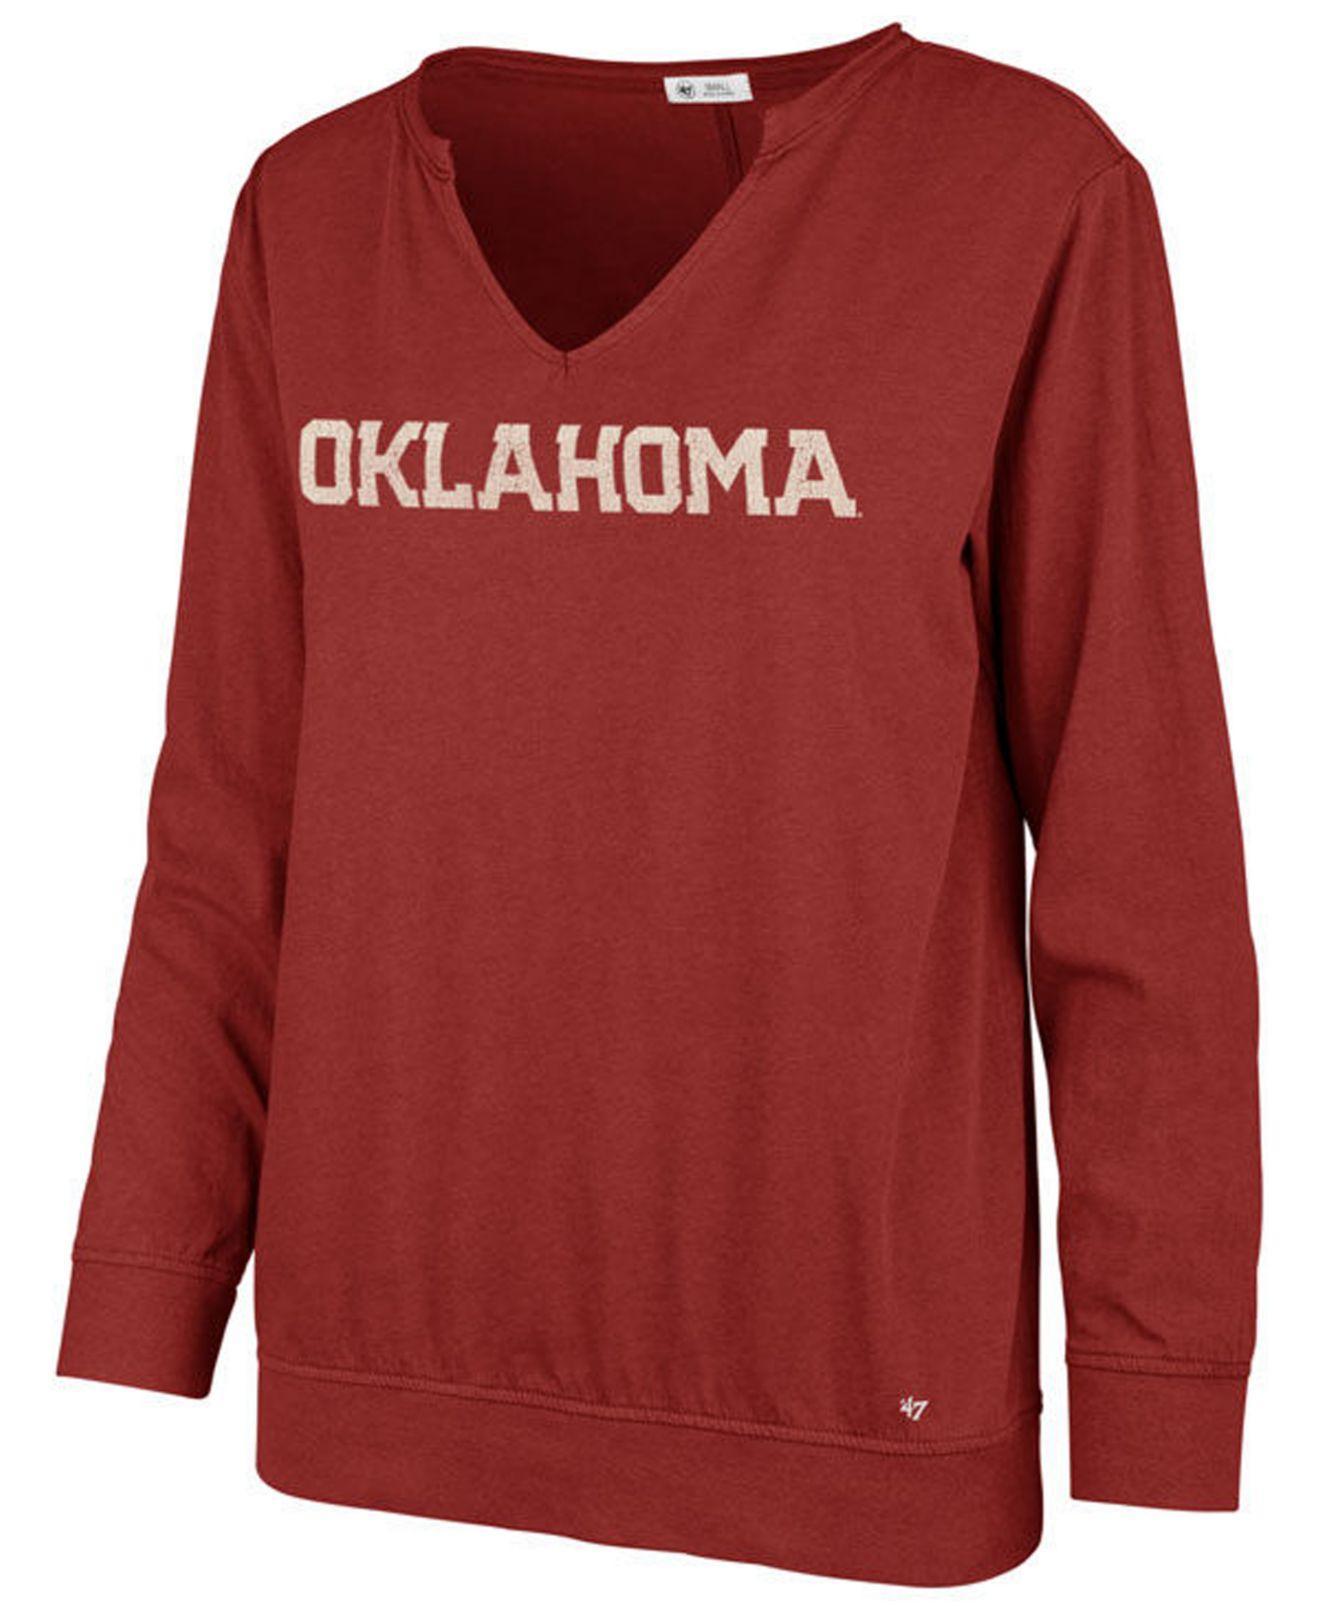 8e8b4c29 Lyst - 47 Brand Oklahoma Sooners Gamma Long Sleeve T-shirt in Red